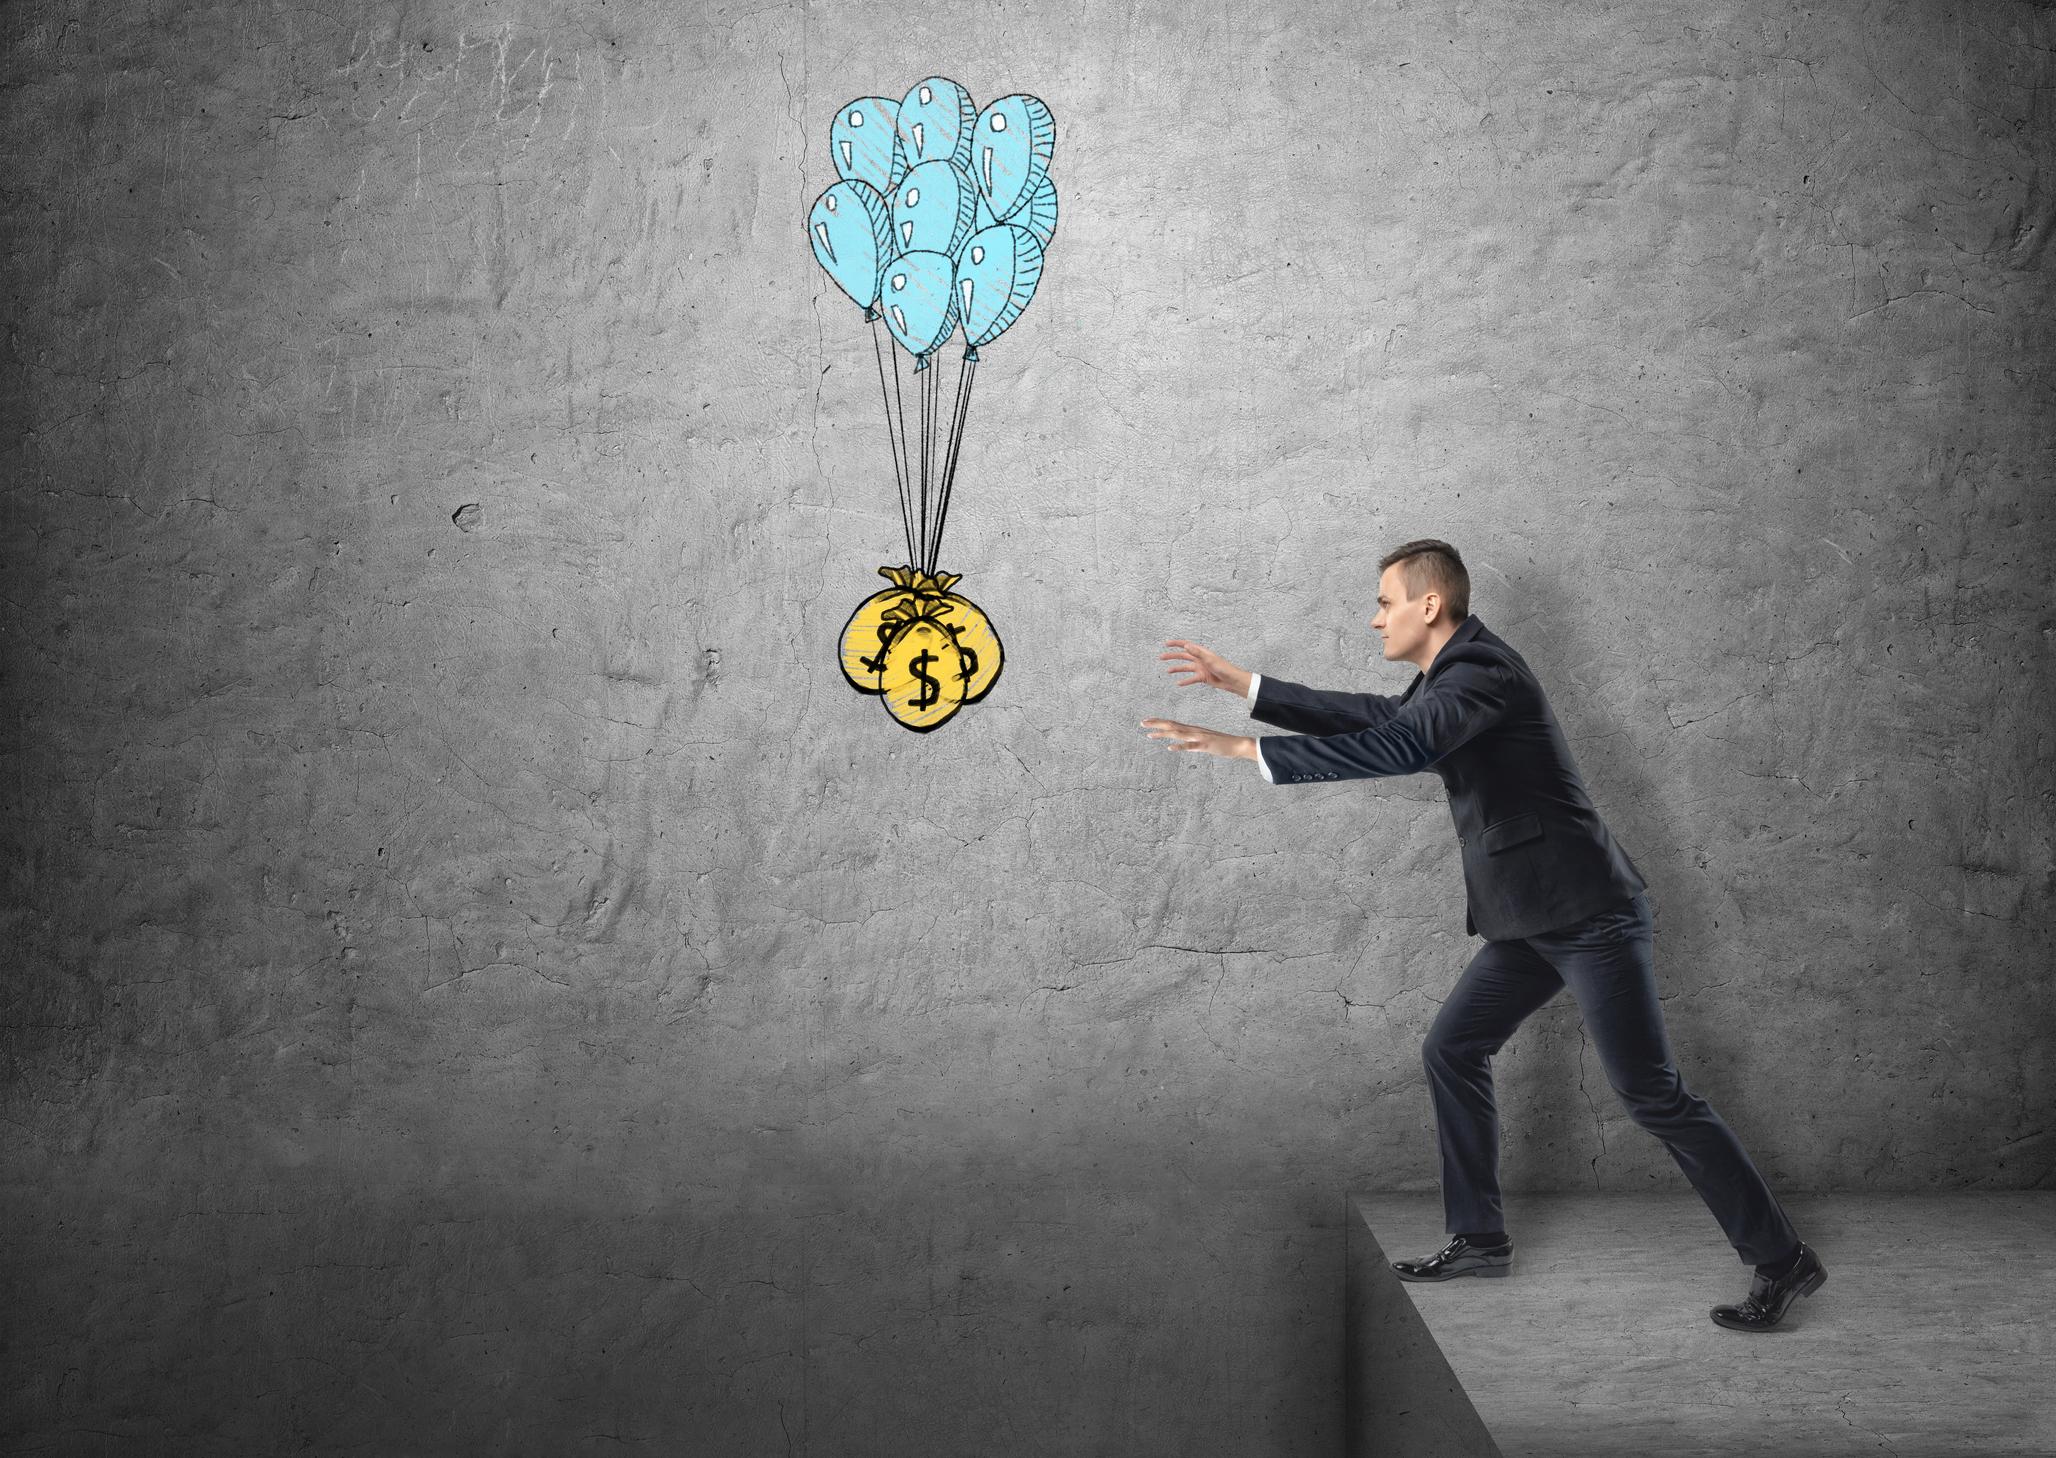 Businessman on ledge reaching for sacks of money tied beneath balloons